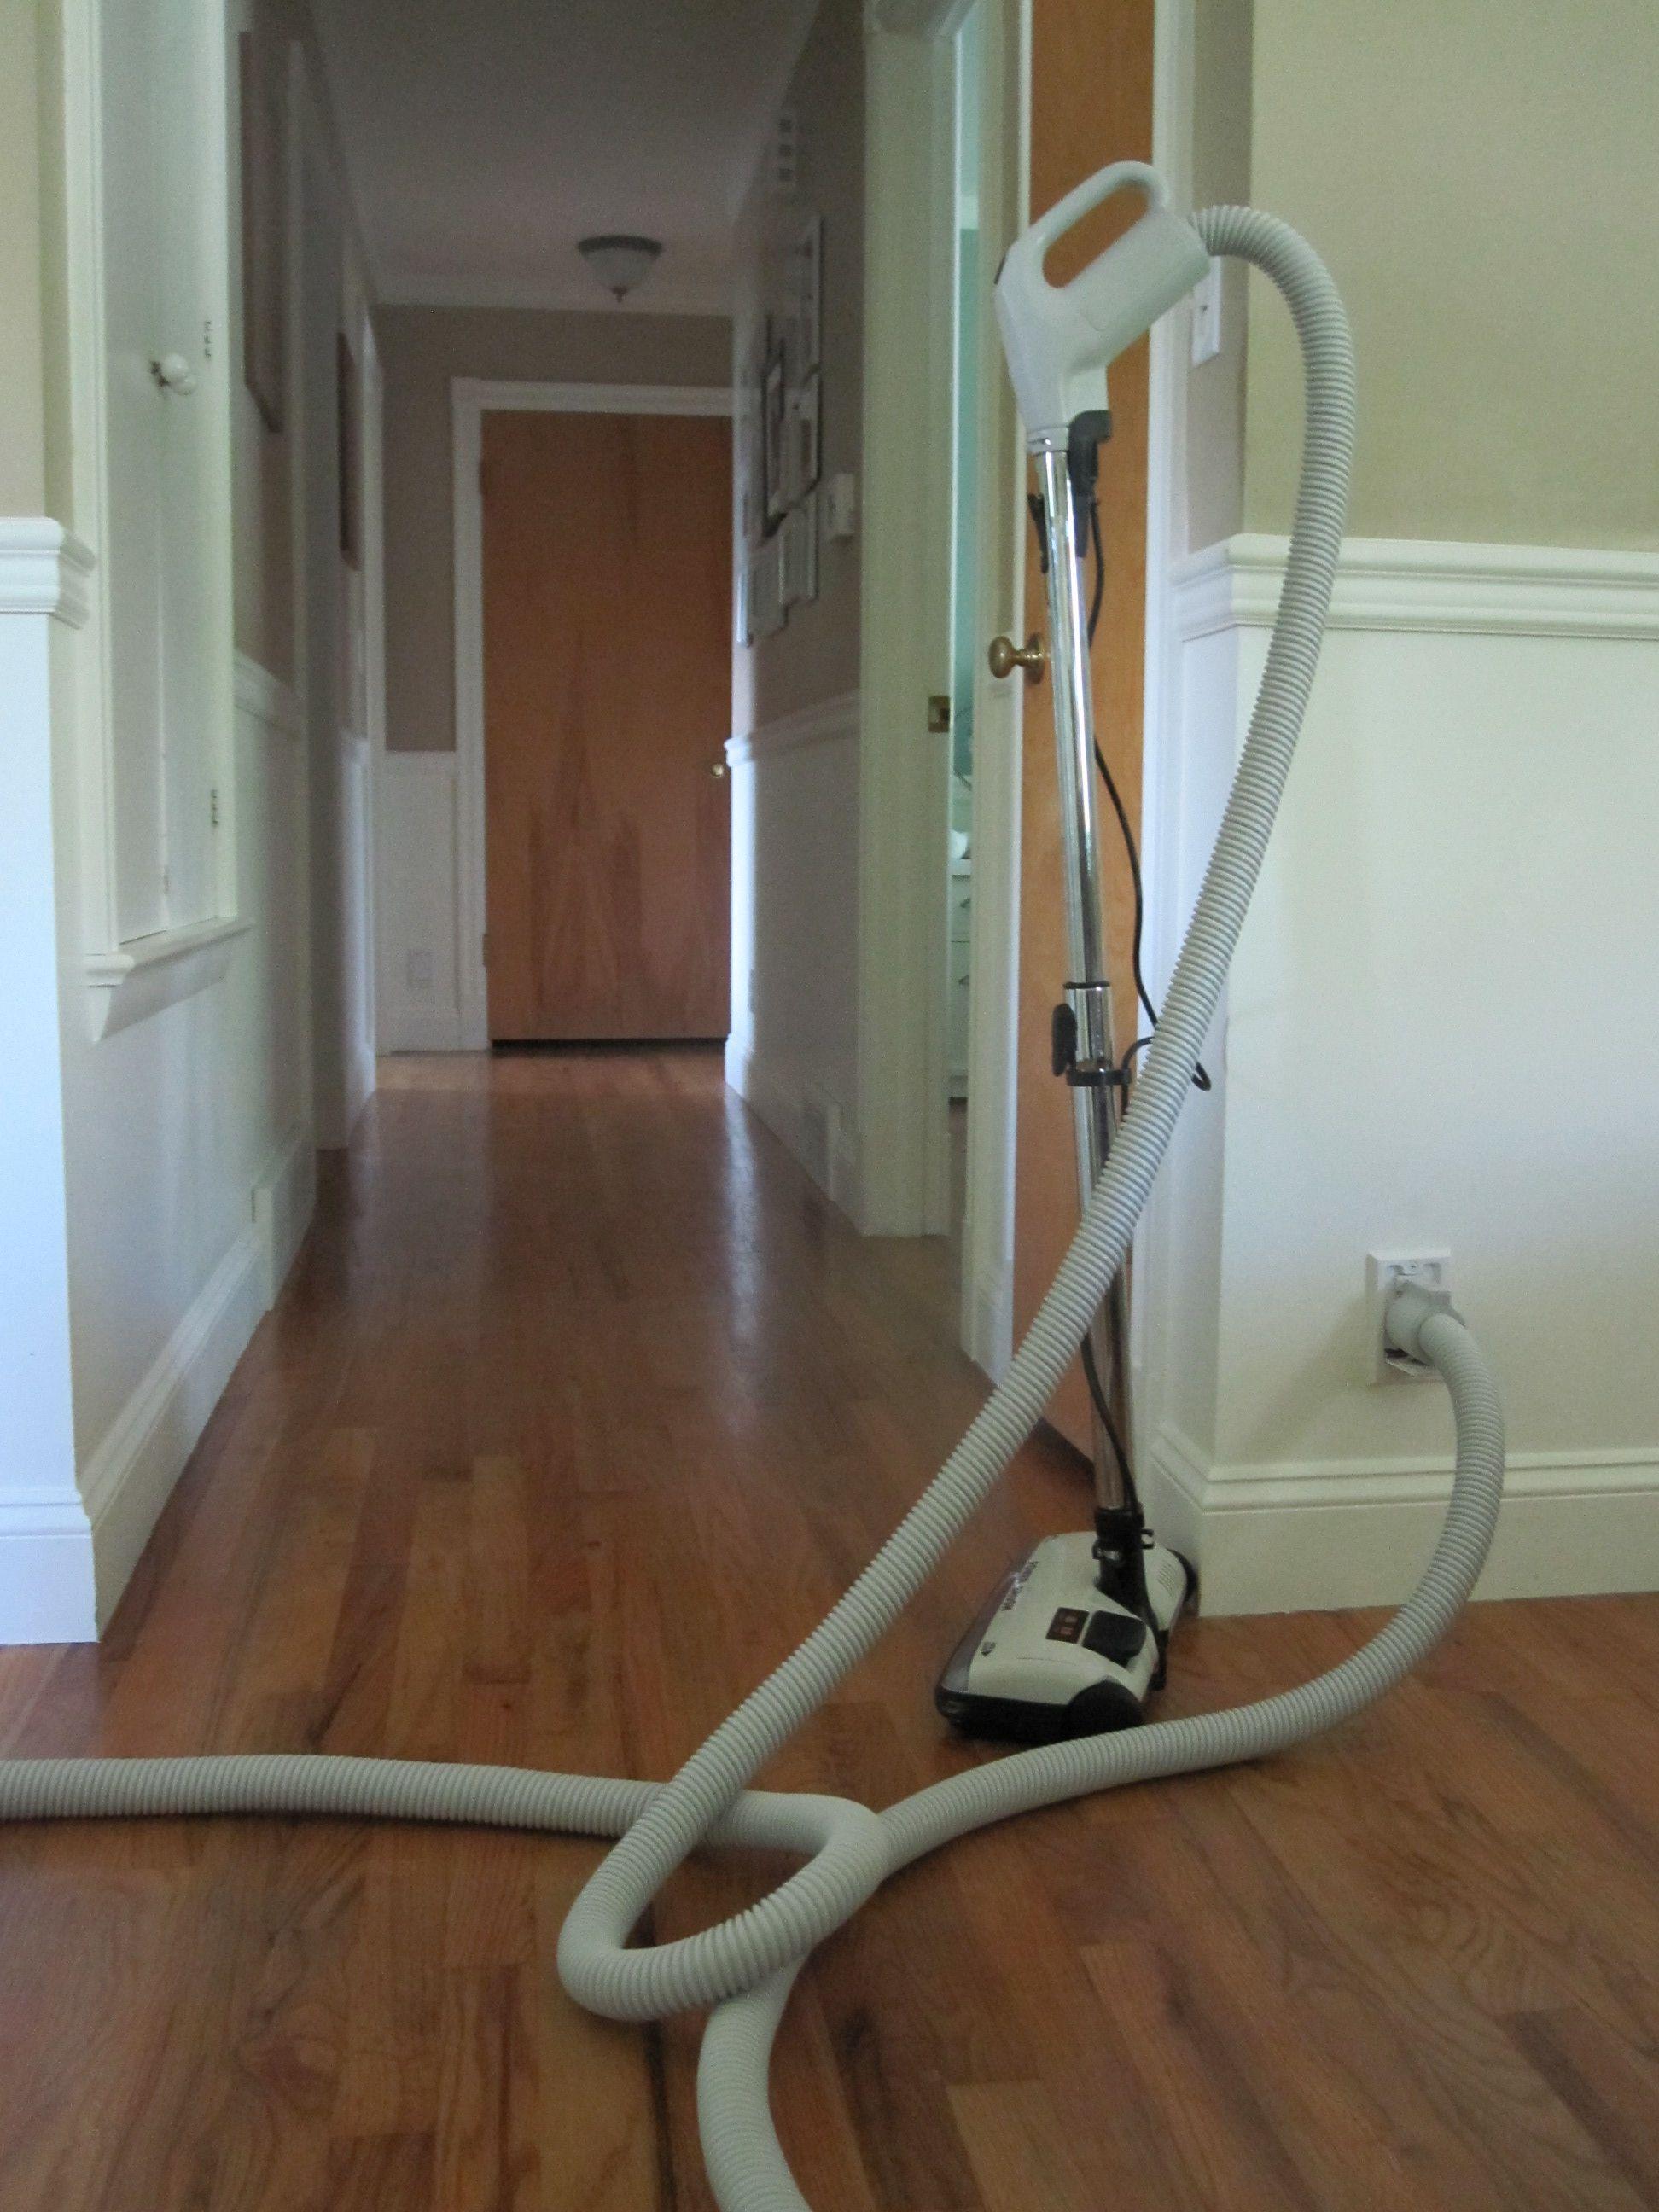 Central Vacuum System So Smart Vacuums Garage Remodel